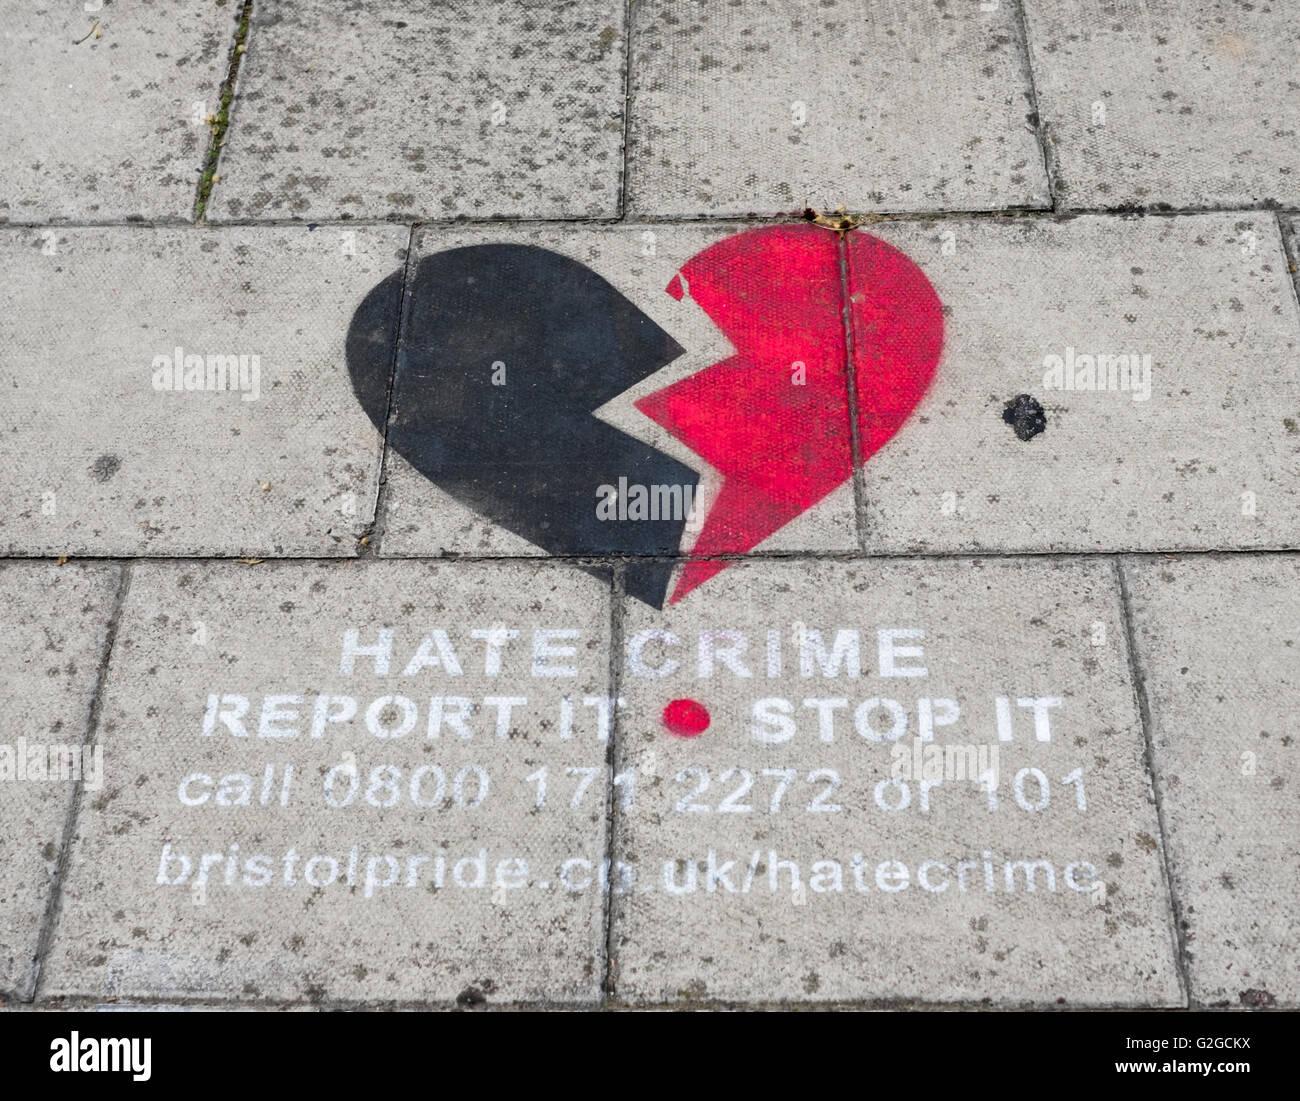 Mural de pavimento destacando el sitio de un crimen de odio en Bristol Imagen De Stock